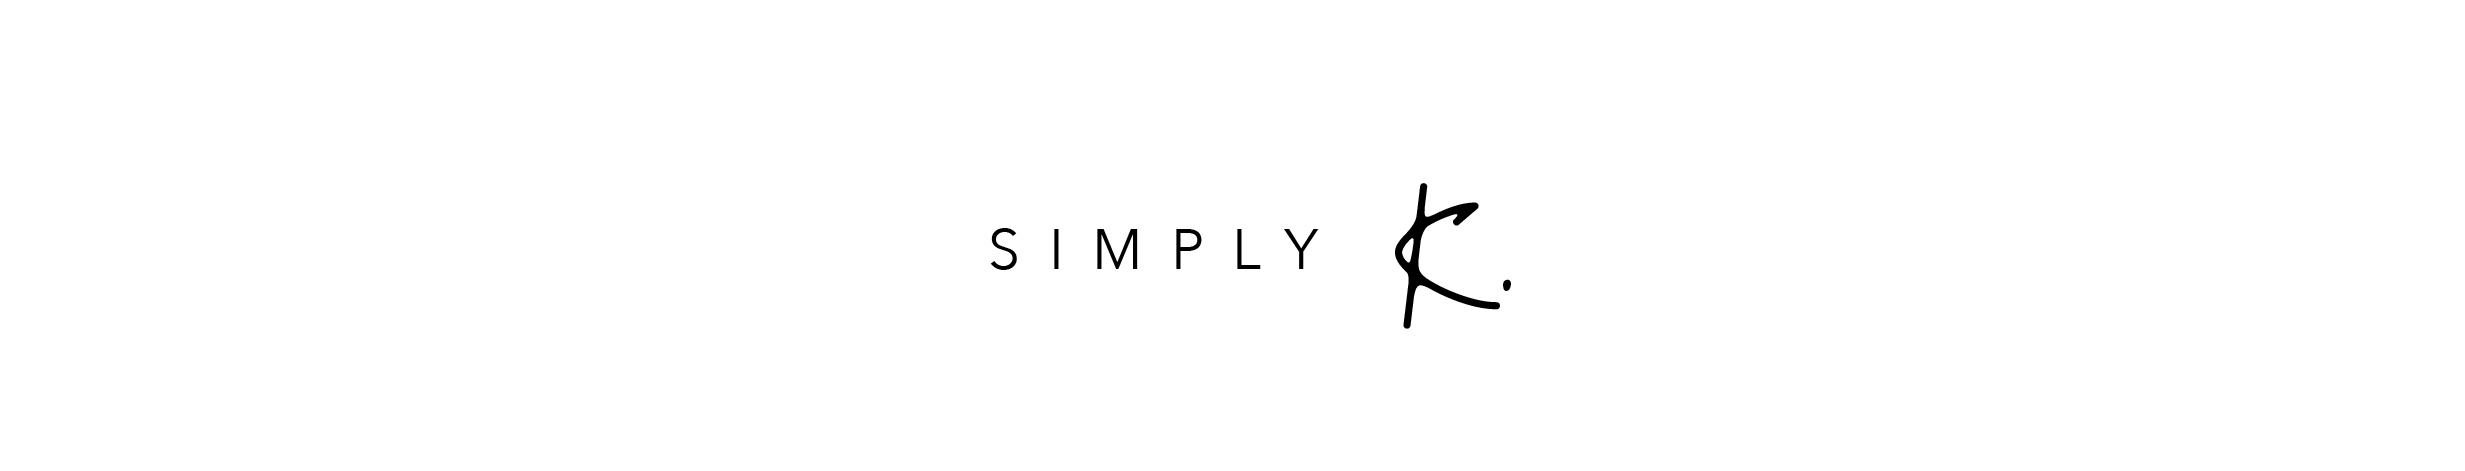 Simply K. blog